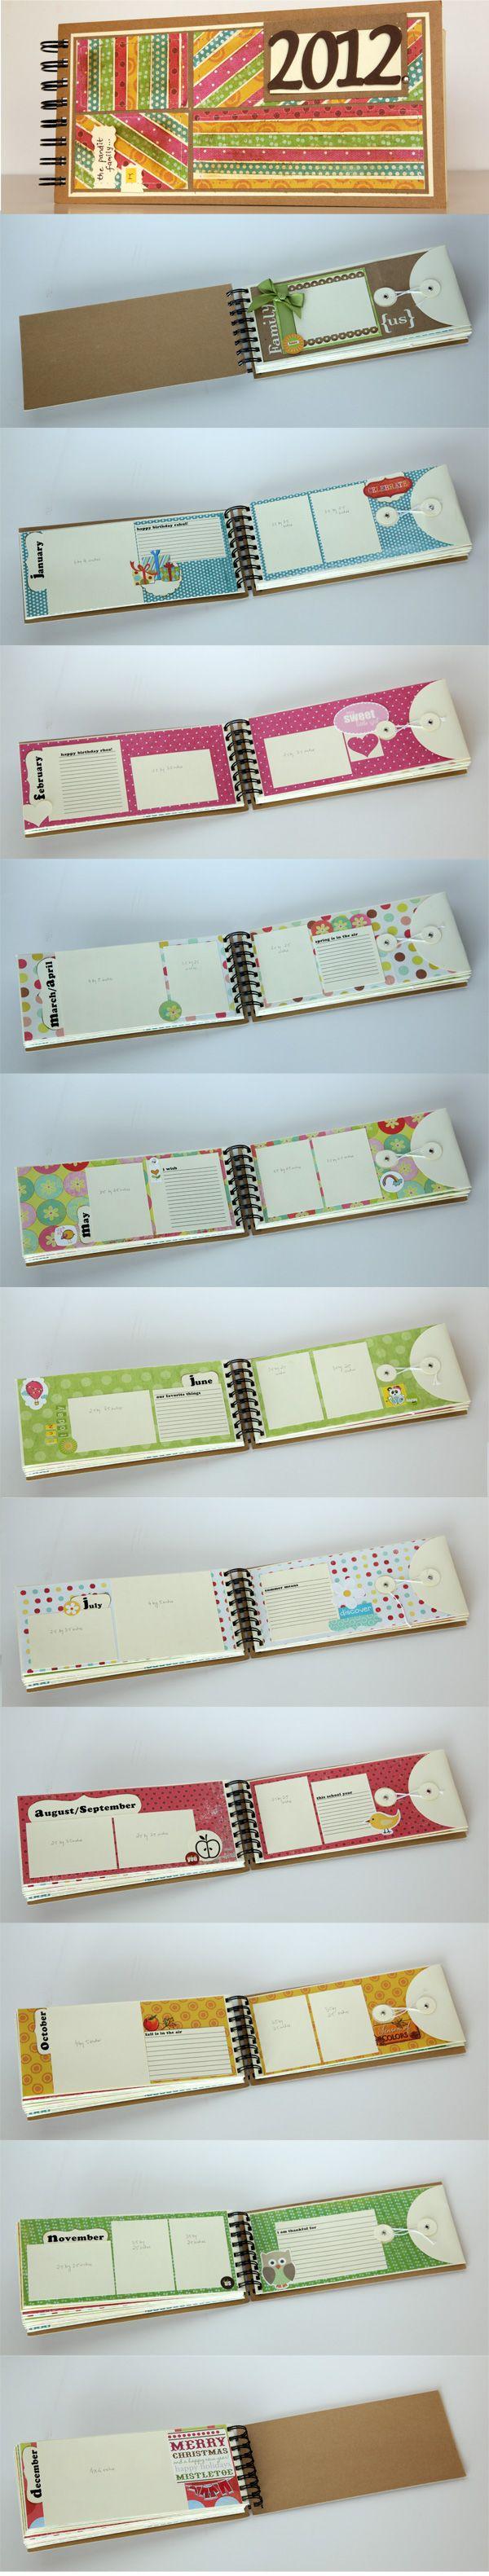 Scrapbook ideas mini books - 1247 Best Images About Cinch On Pinterest Simple Stories Mini Scrapbooks And Teresa Collins